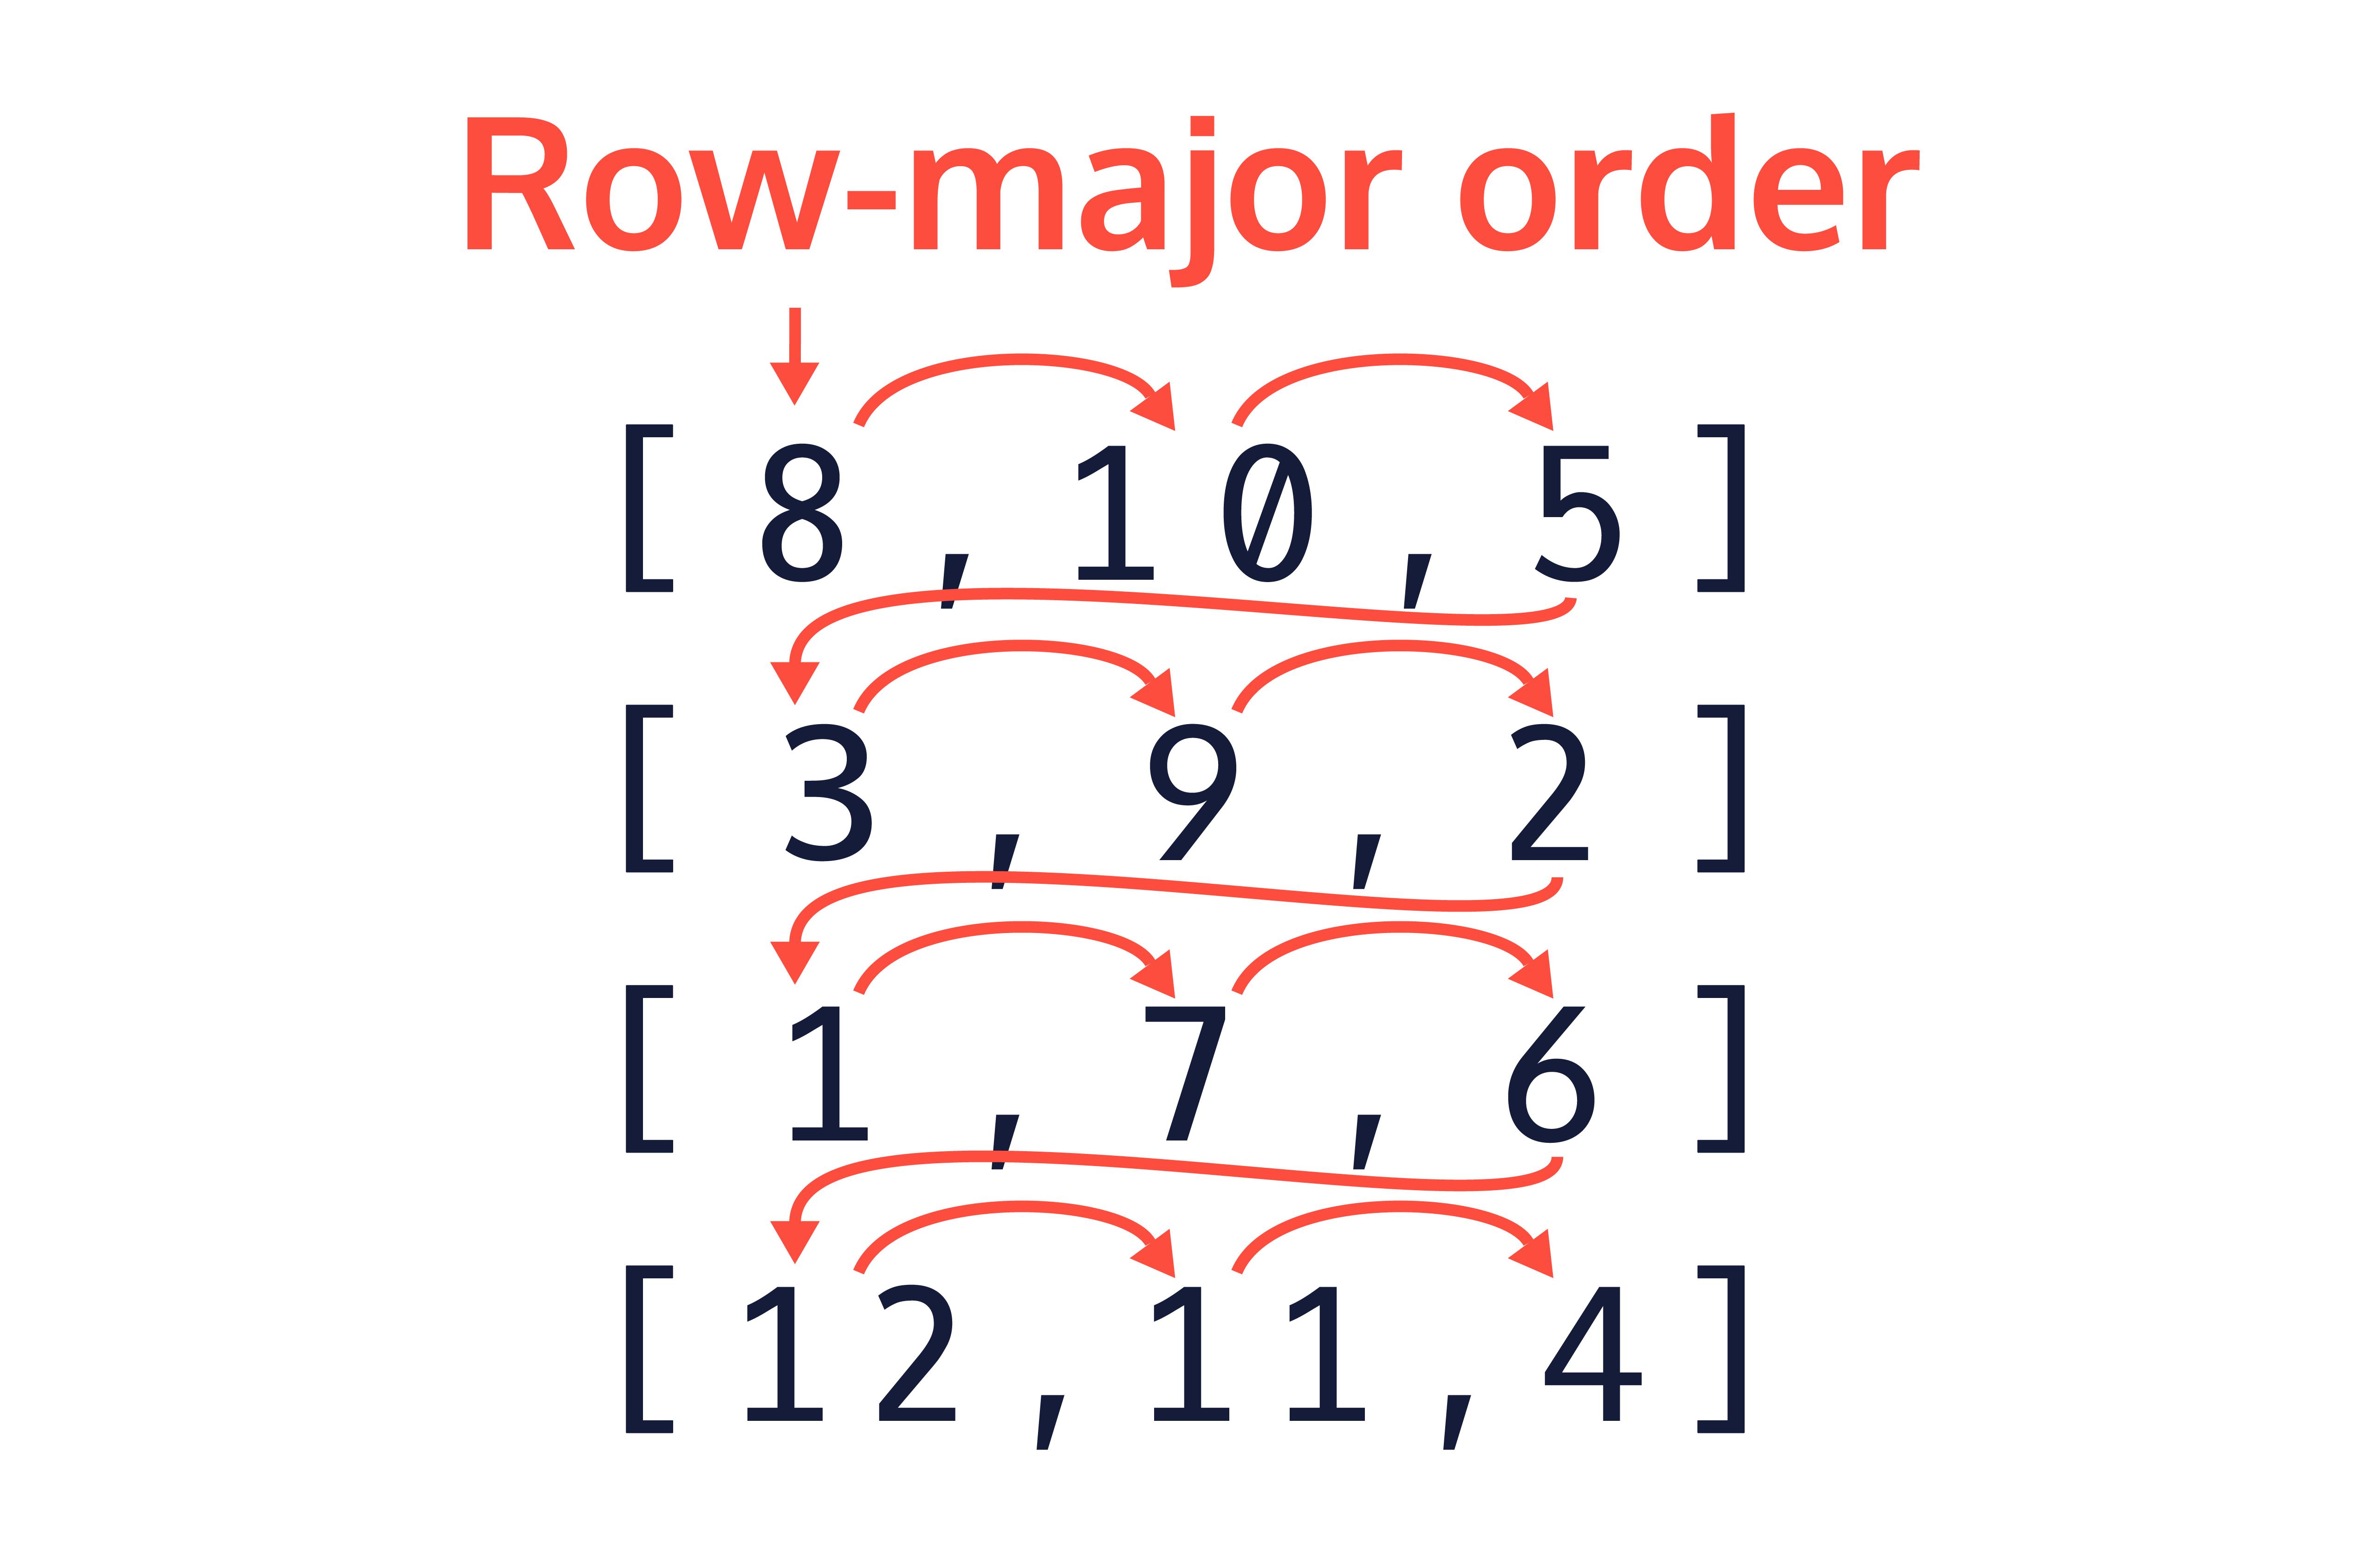 Traversing across each row